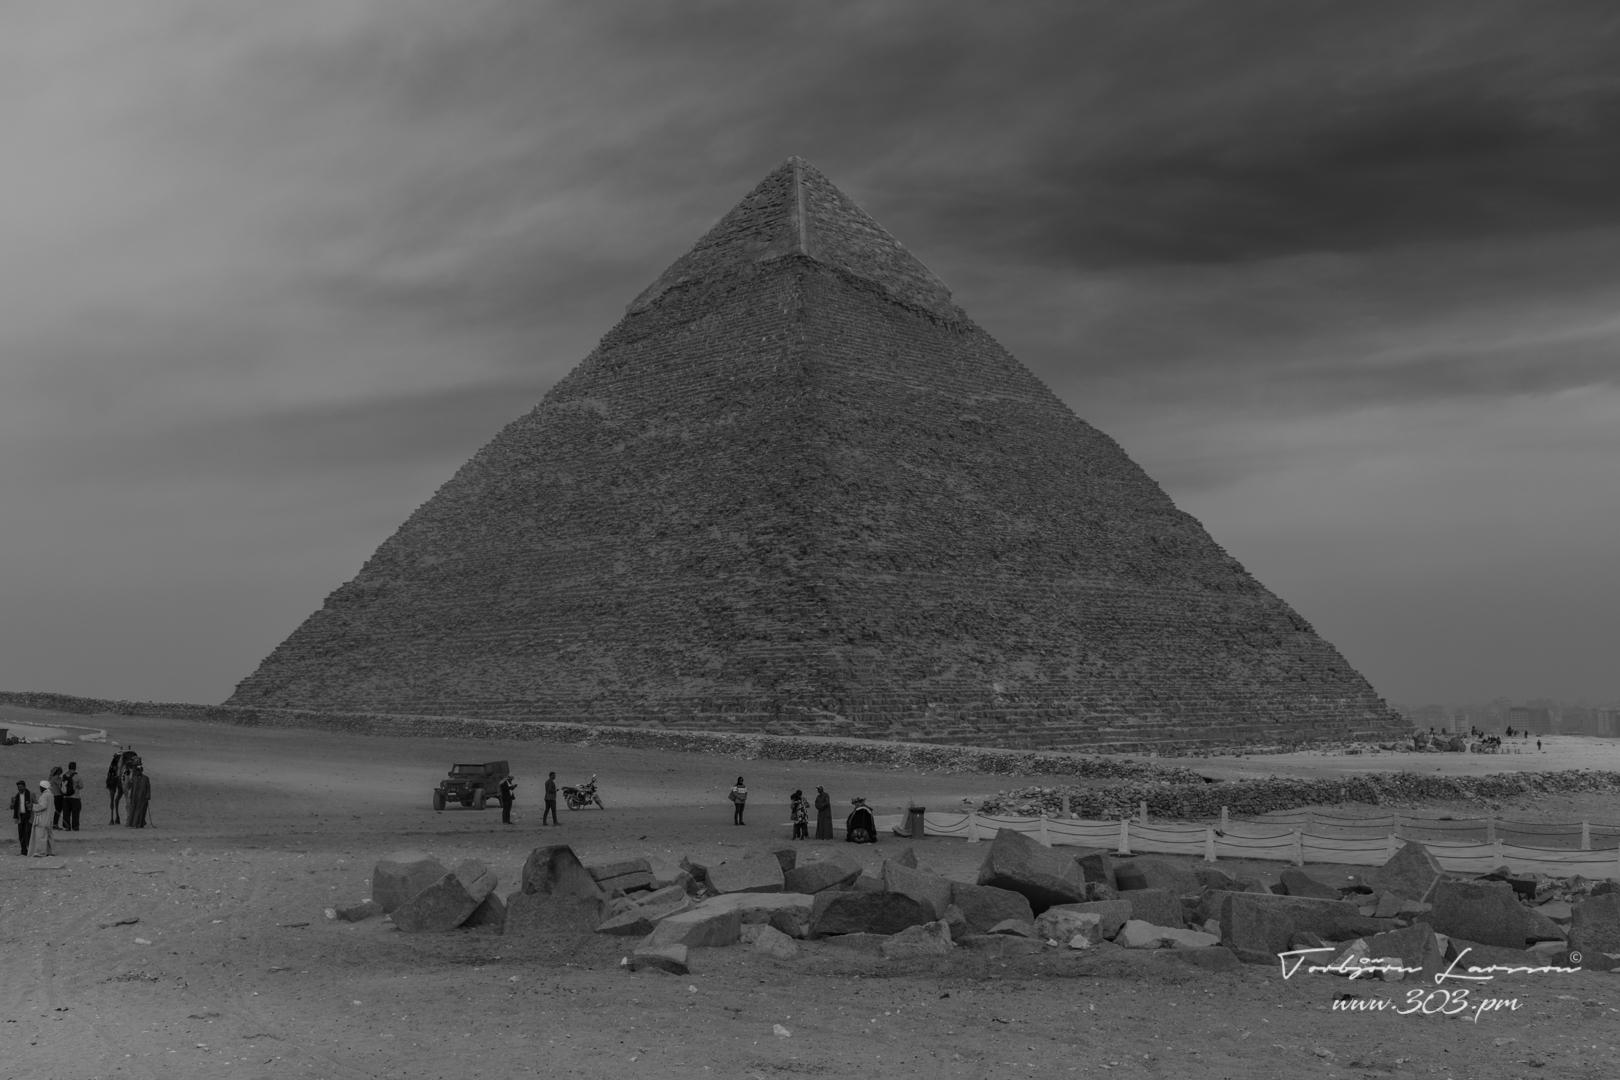 Chefrens pyramid Giza